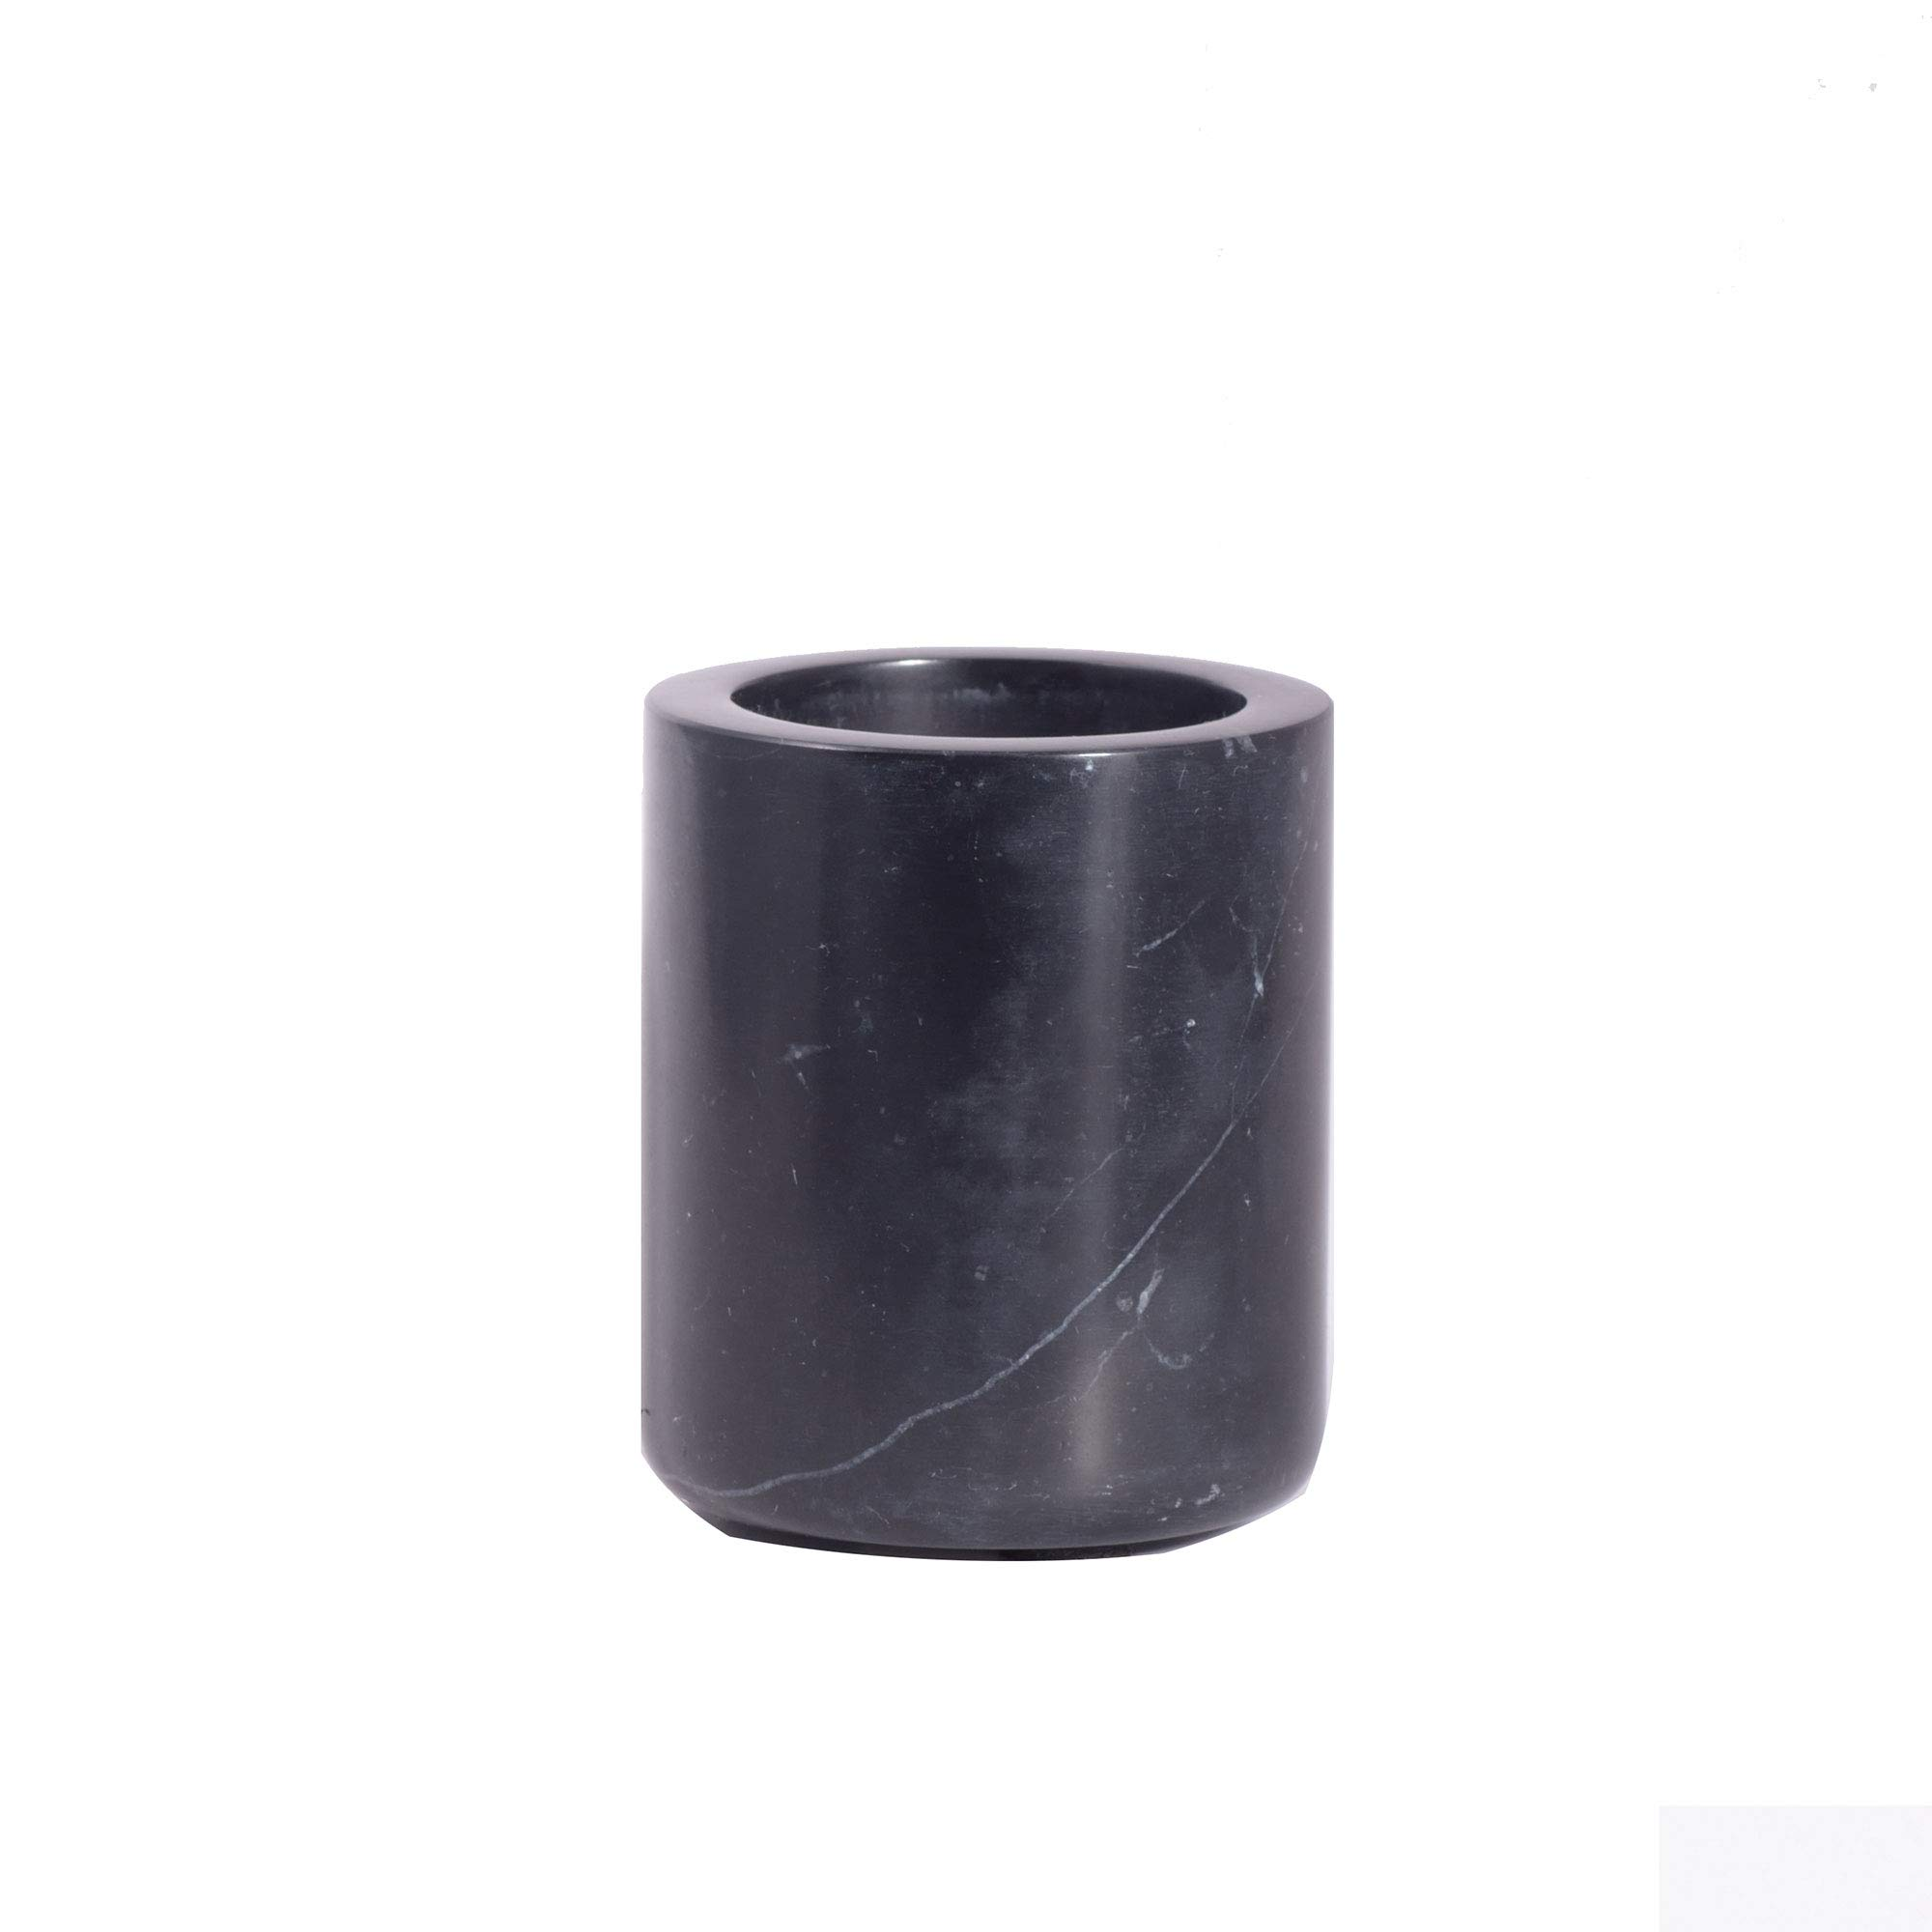 Vaso para cepillos de Dientes m/ármol Negro houseproud Marquina